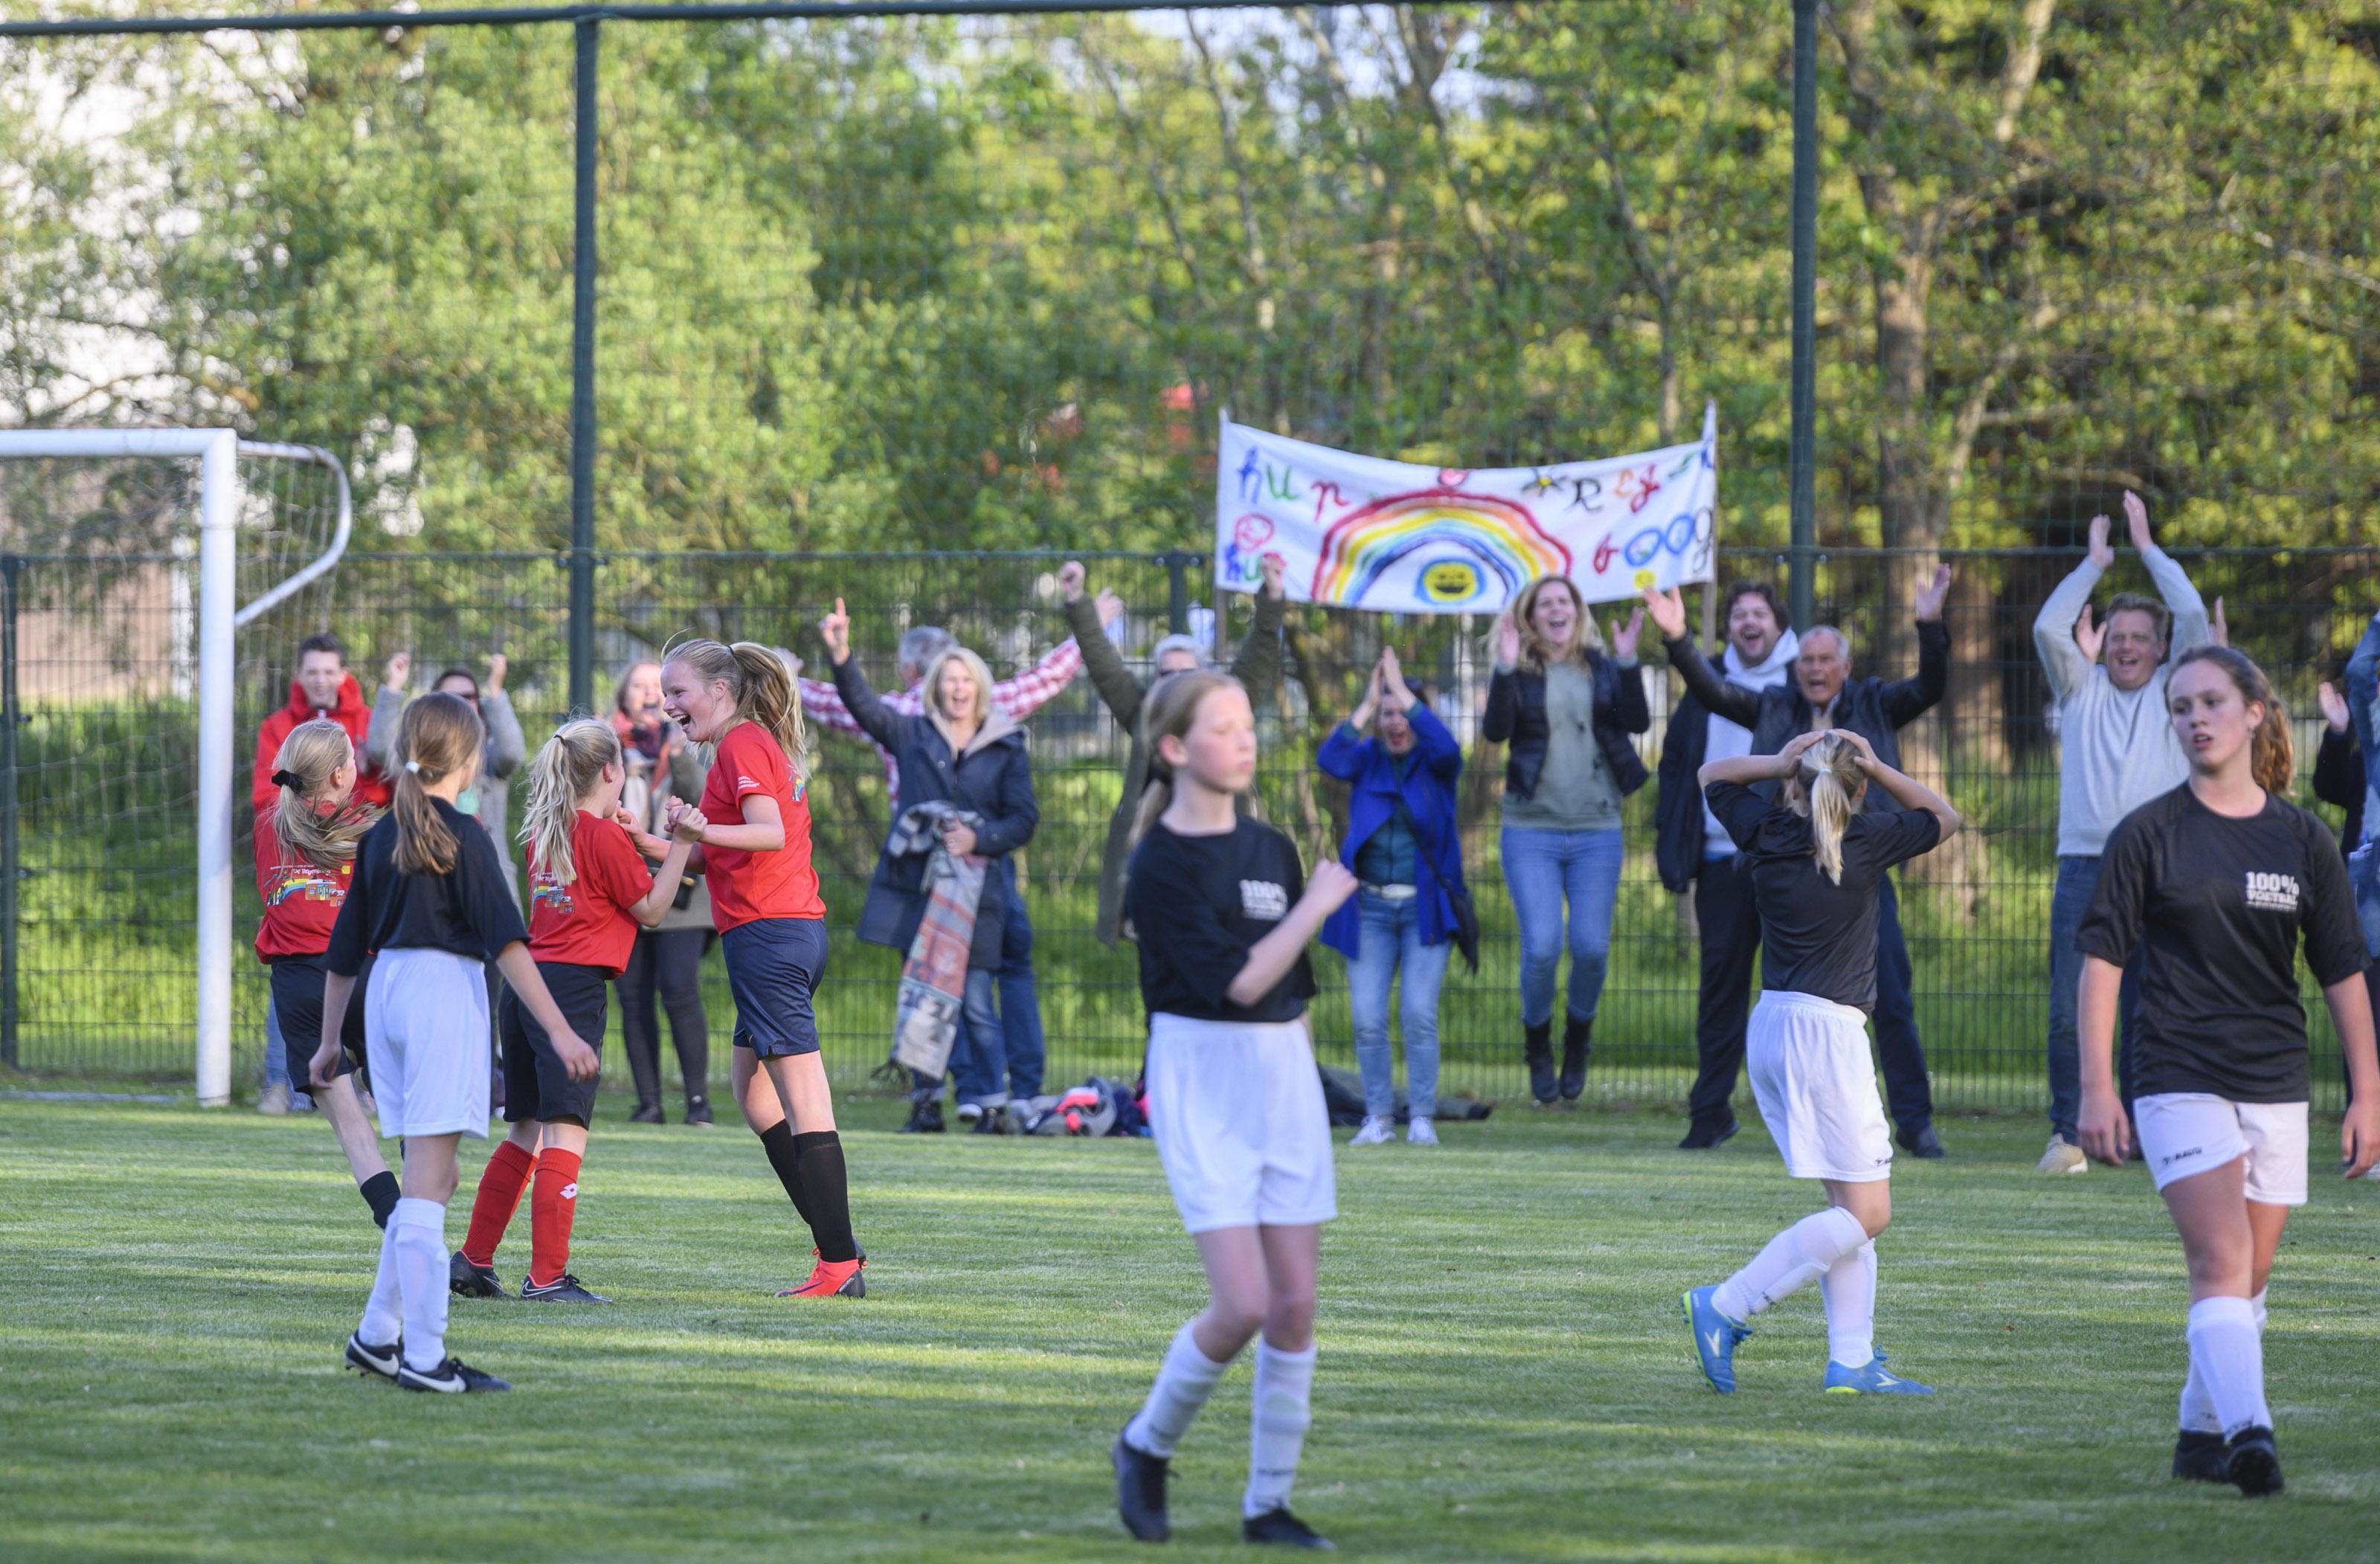 Finales schoolvoetbal: Kroosduiker en Meander winnaars in Zaanstad